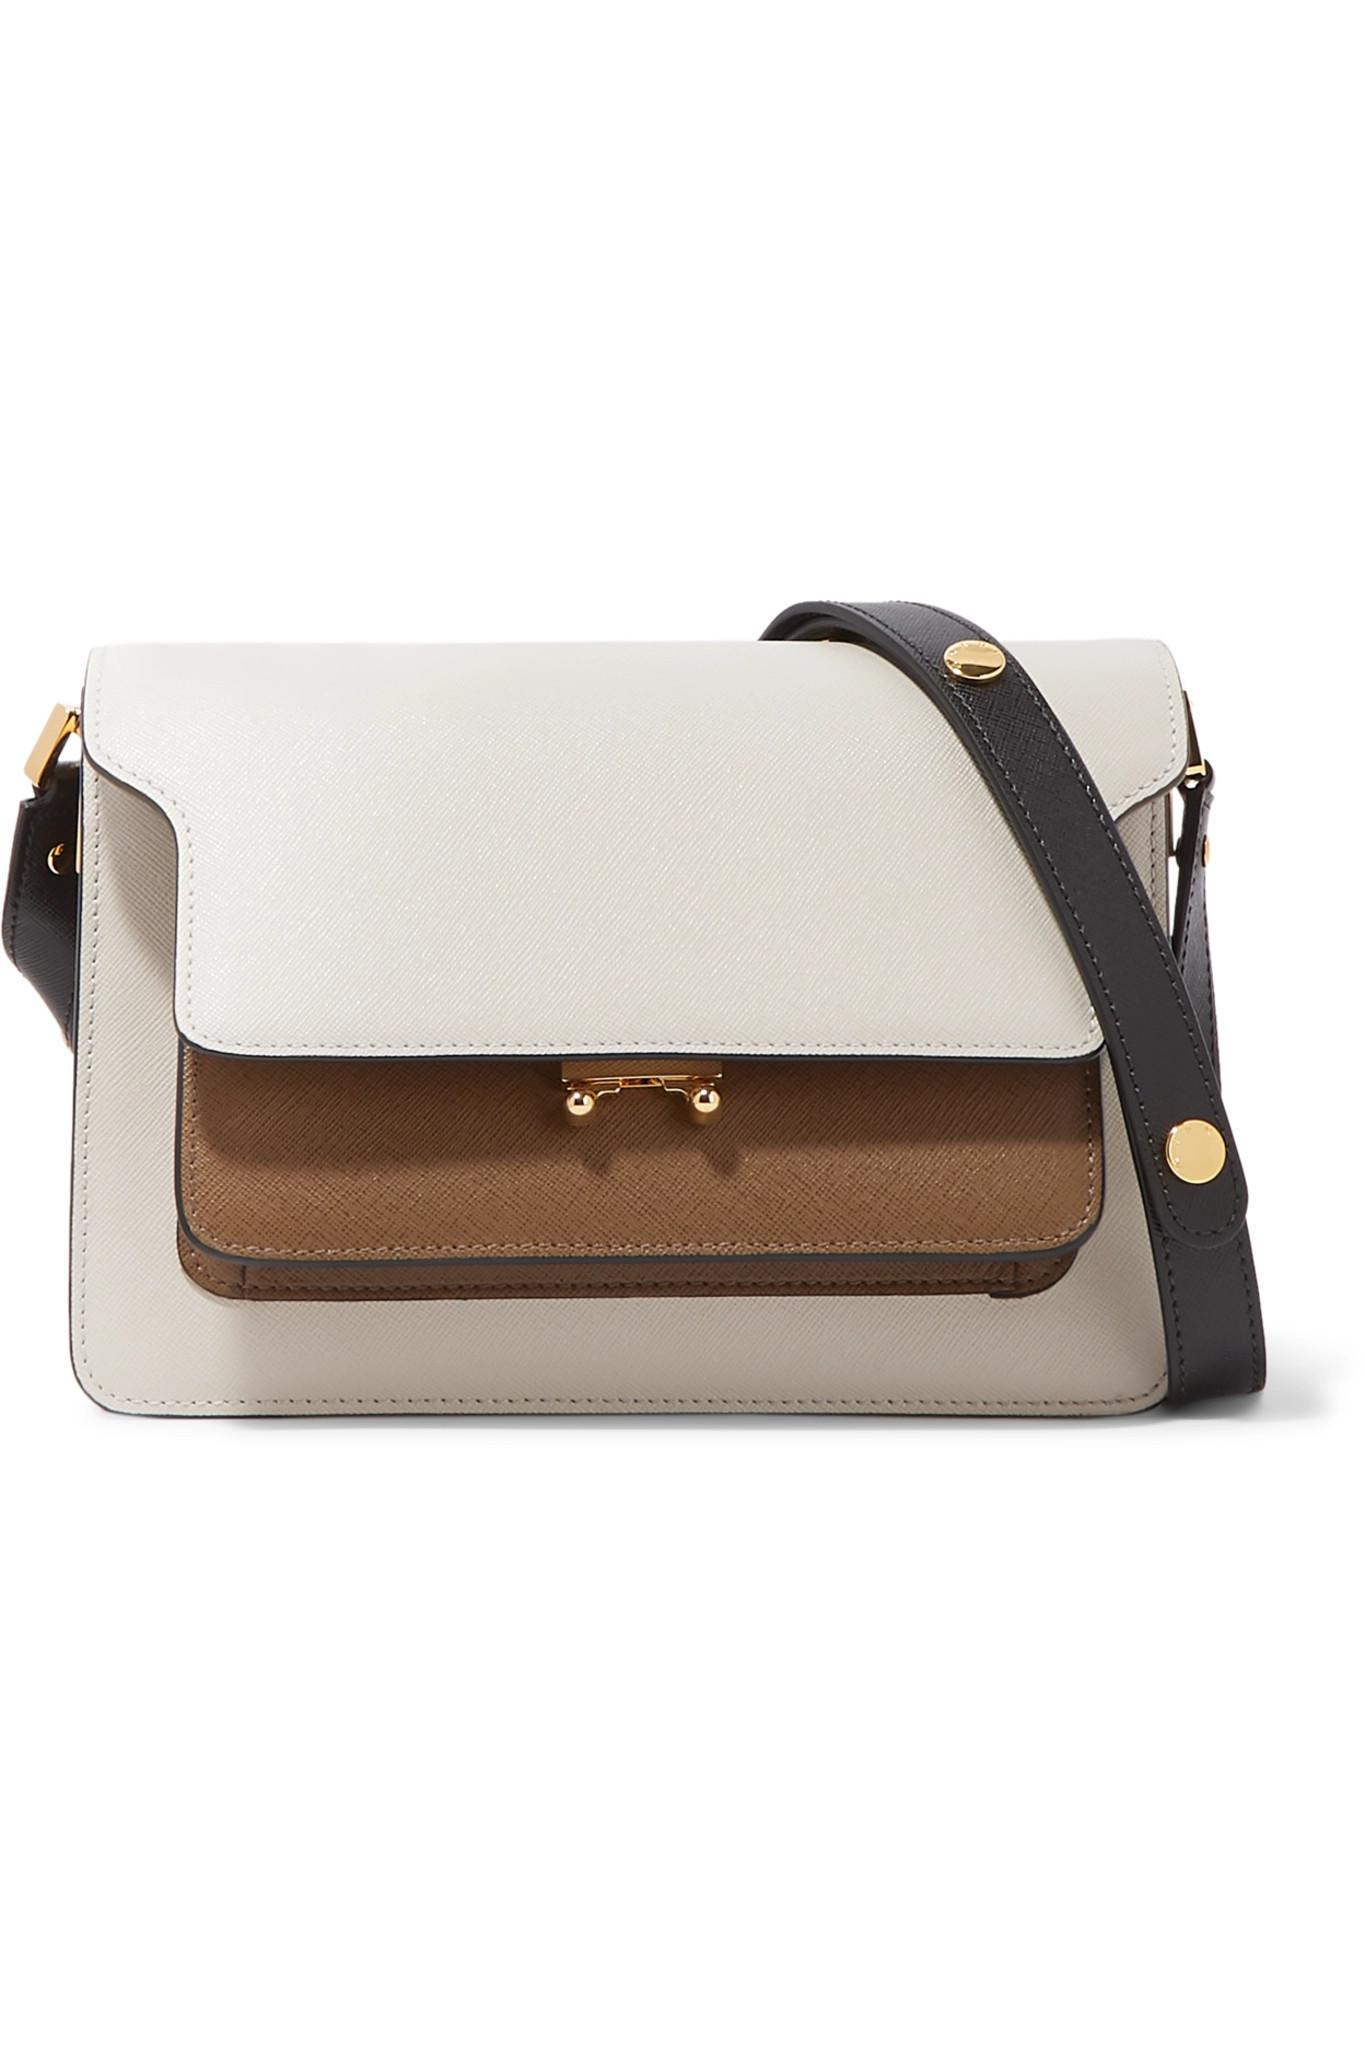 19c809b1707c Marni. Women s White Trunk Medium Color-block Textured-leather Shoulder Bag